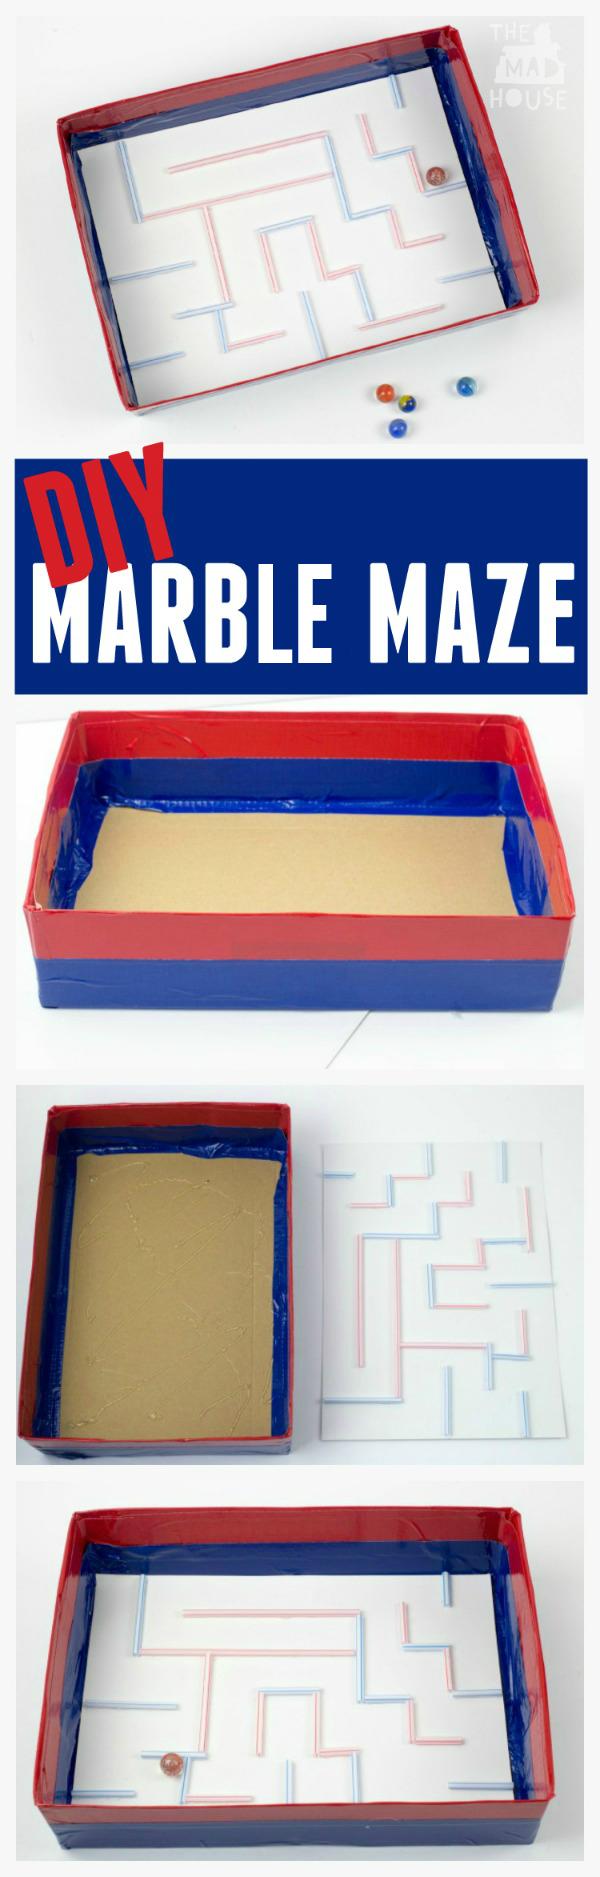 DIY marble maze